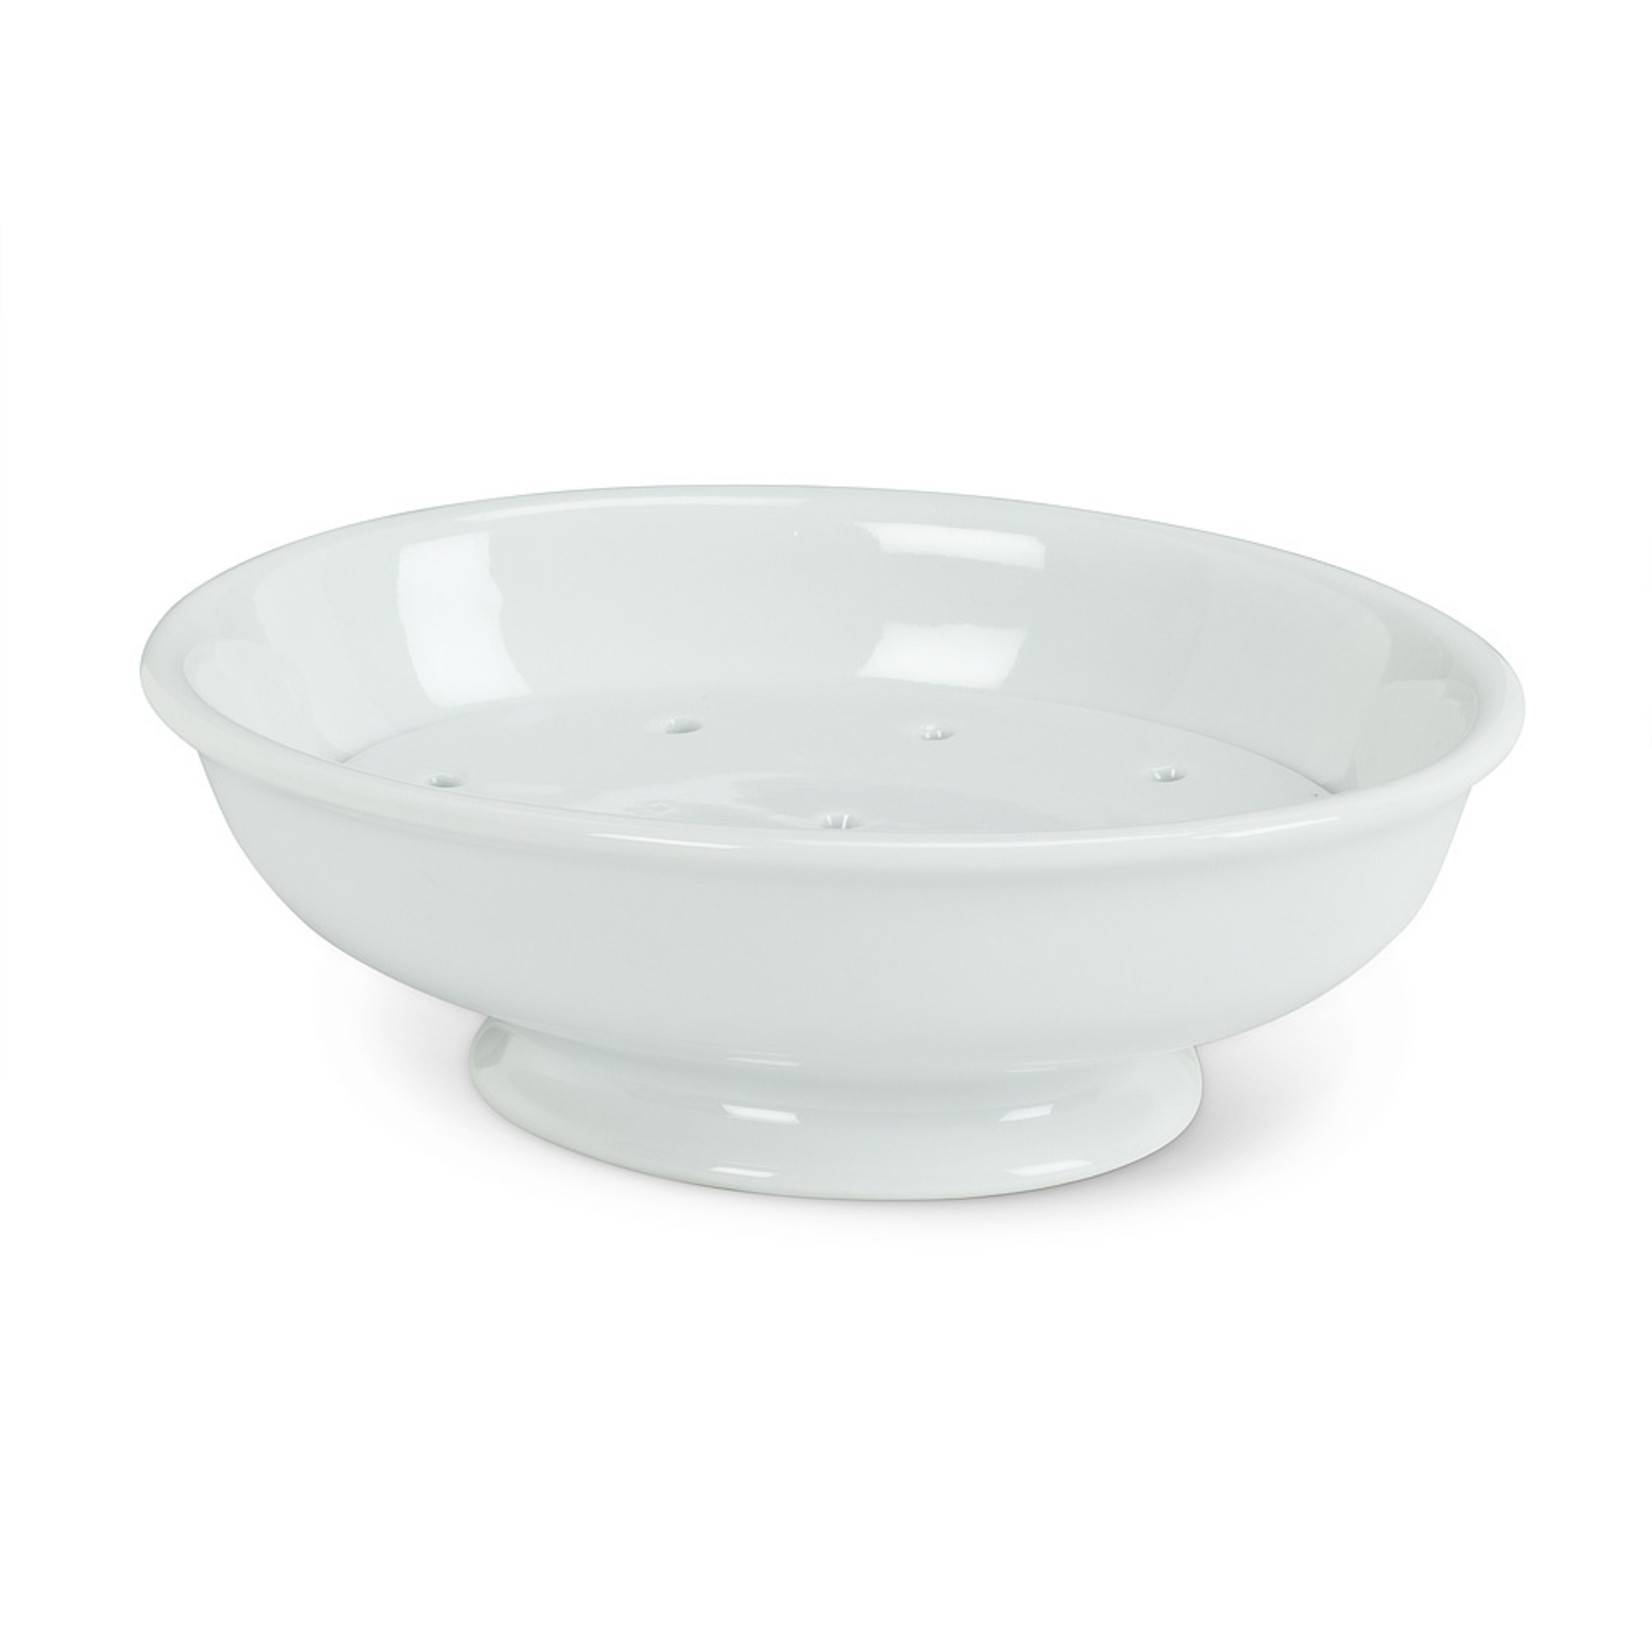 ABBOTT SOAP DISH